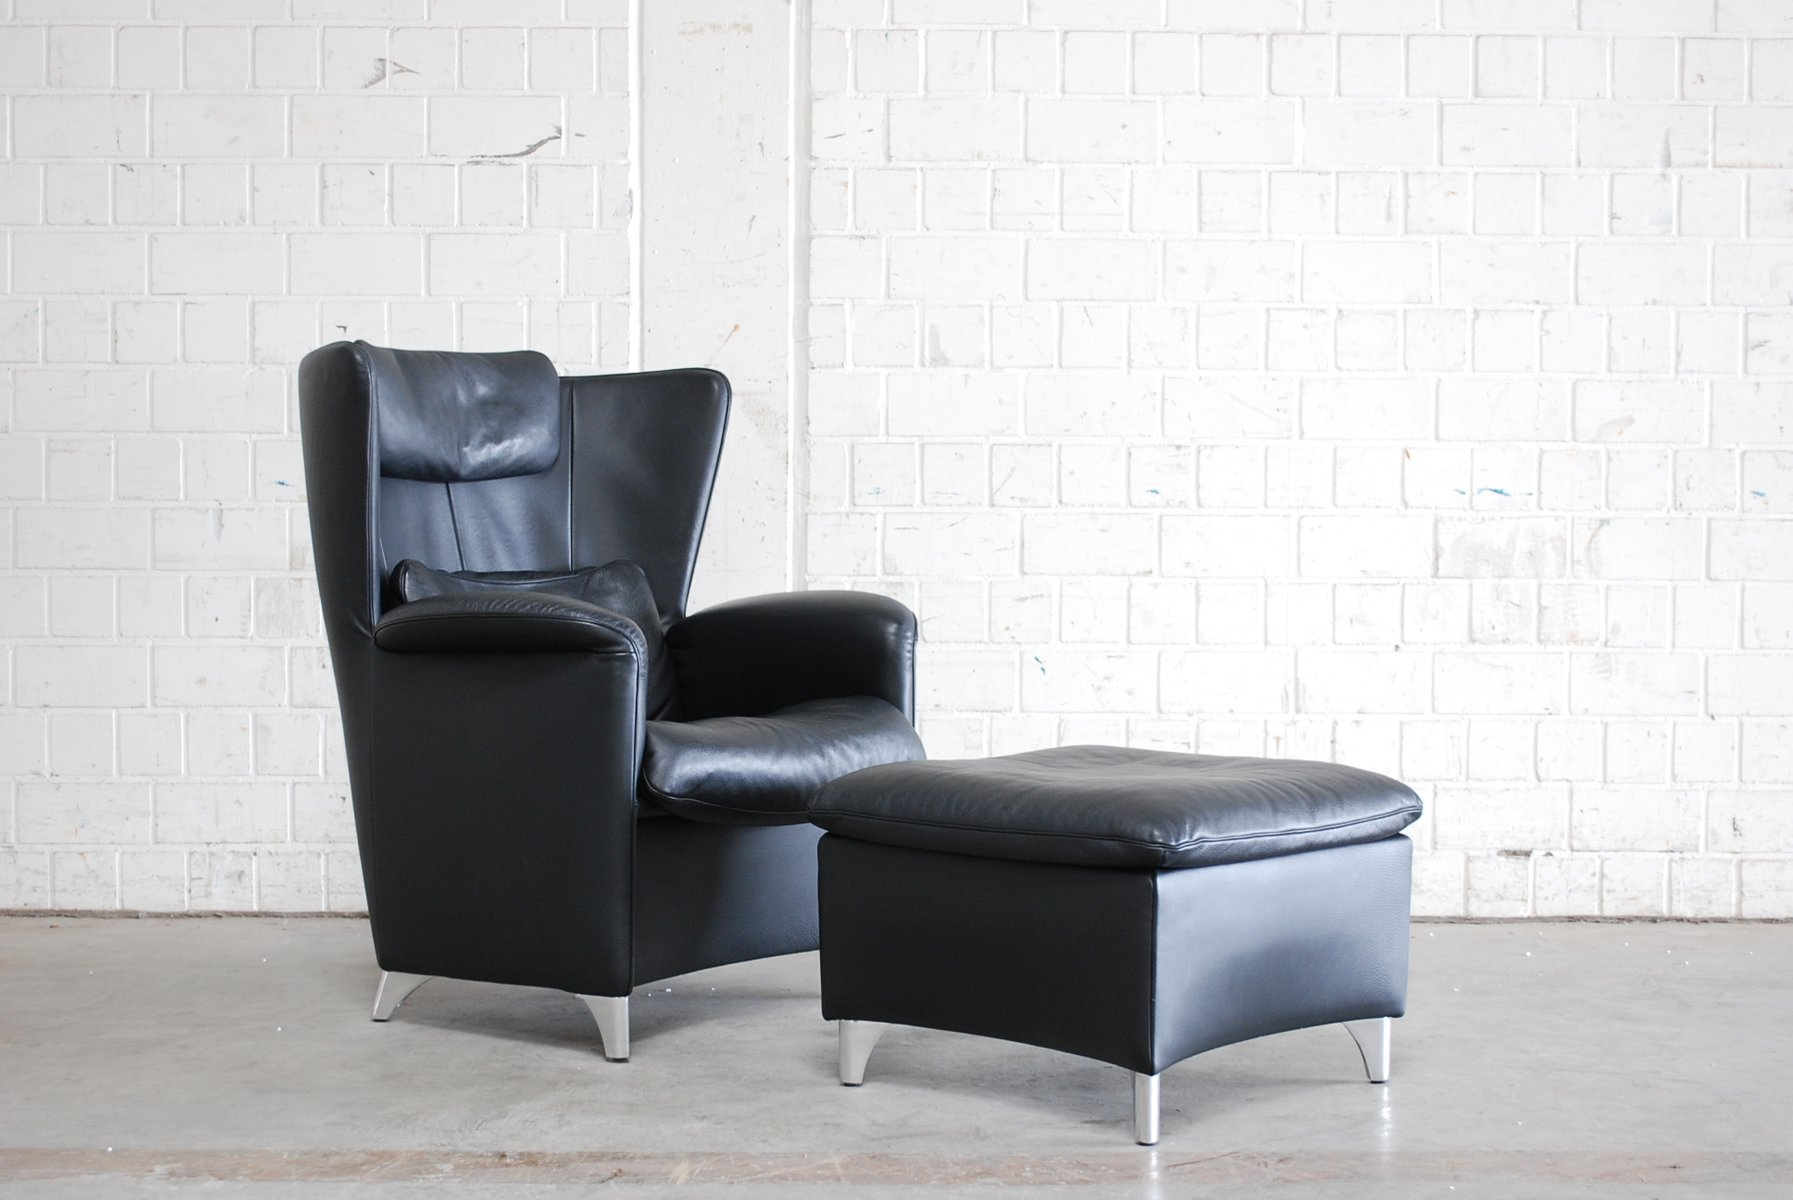 schwarzer ds 23 leder ohrensessel ottomane von franz. Black Bedroom Furniture Sets. Home Design Ideas